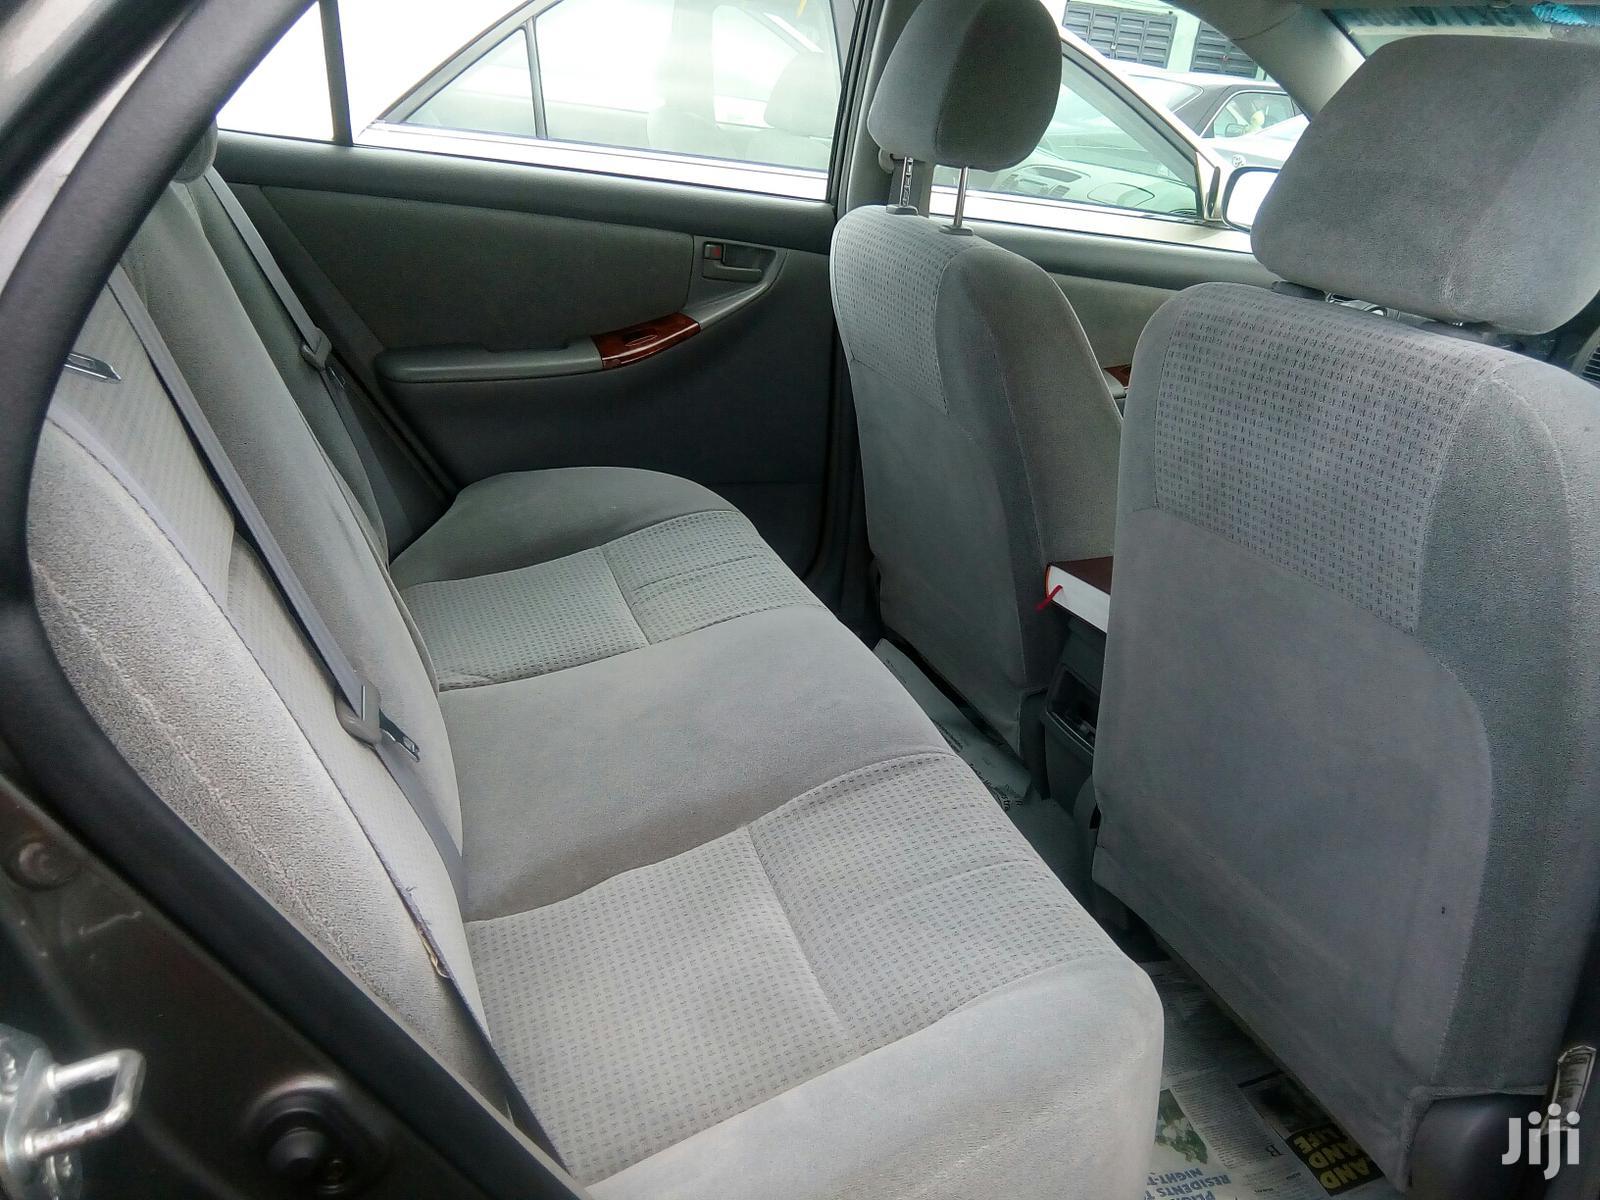 Toyota Corolla 2005 LE Gray | Cars for sale in Apapa, Lagos State, Nigeria